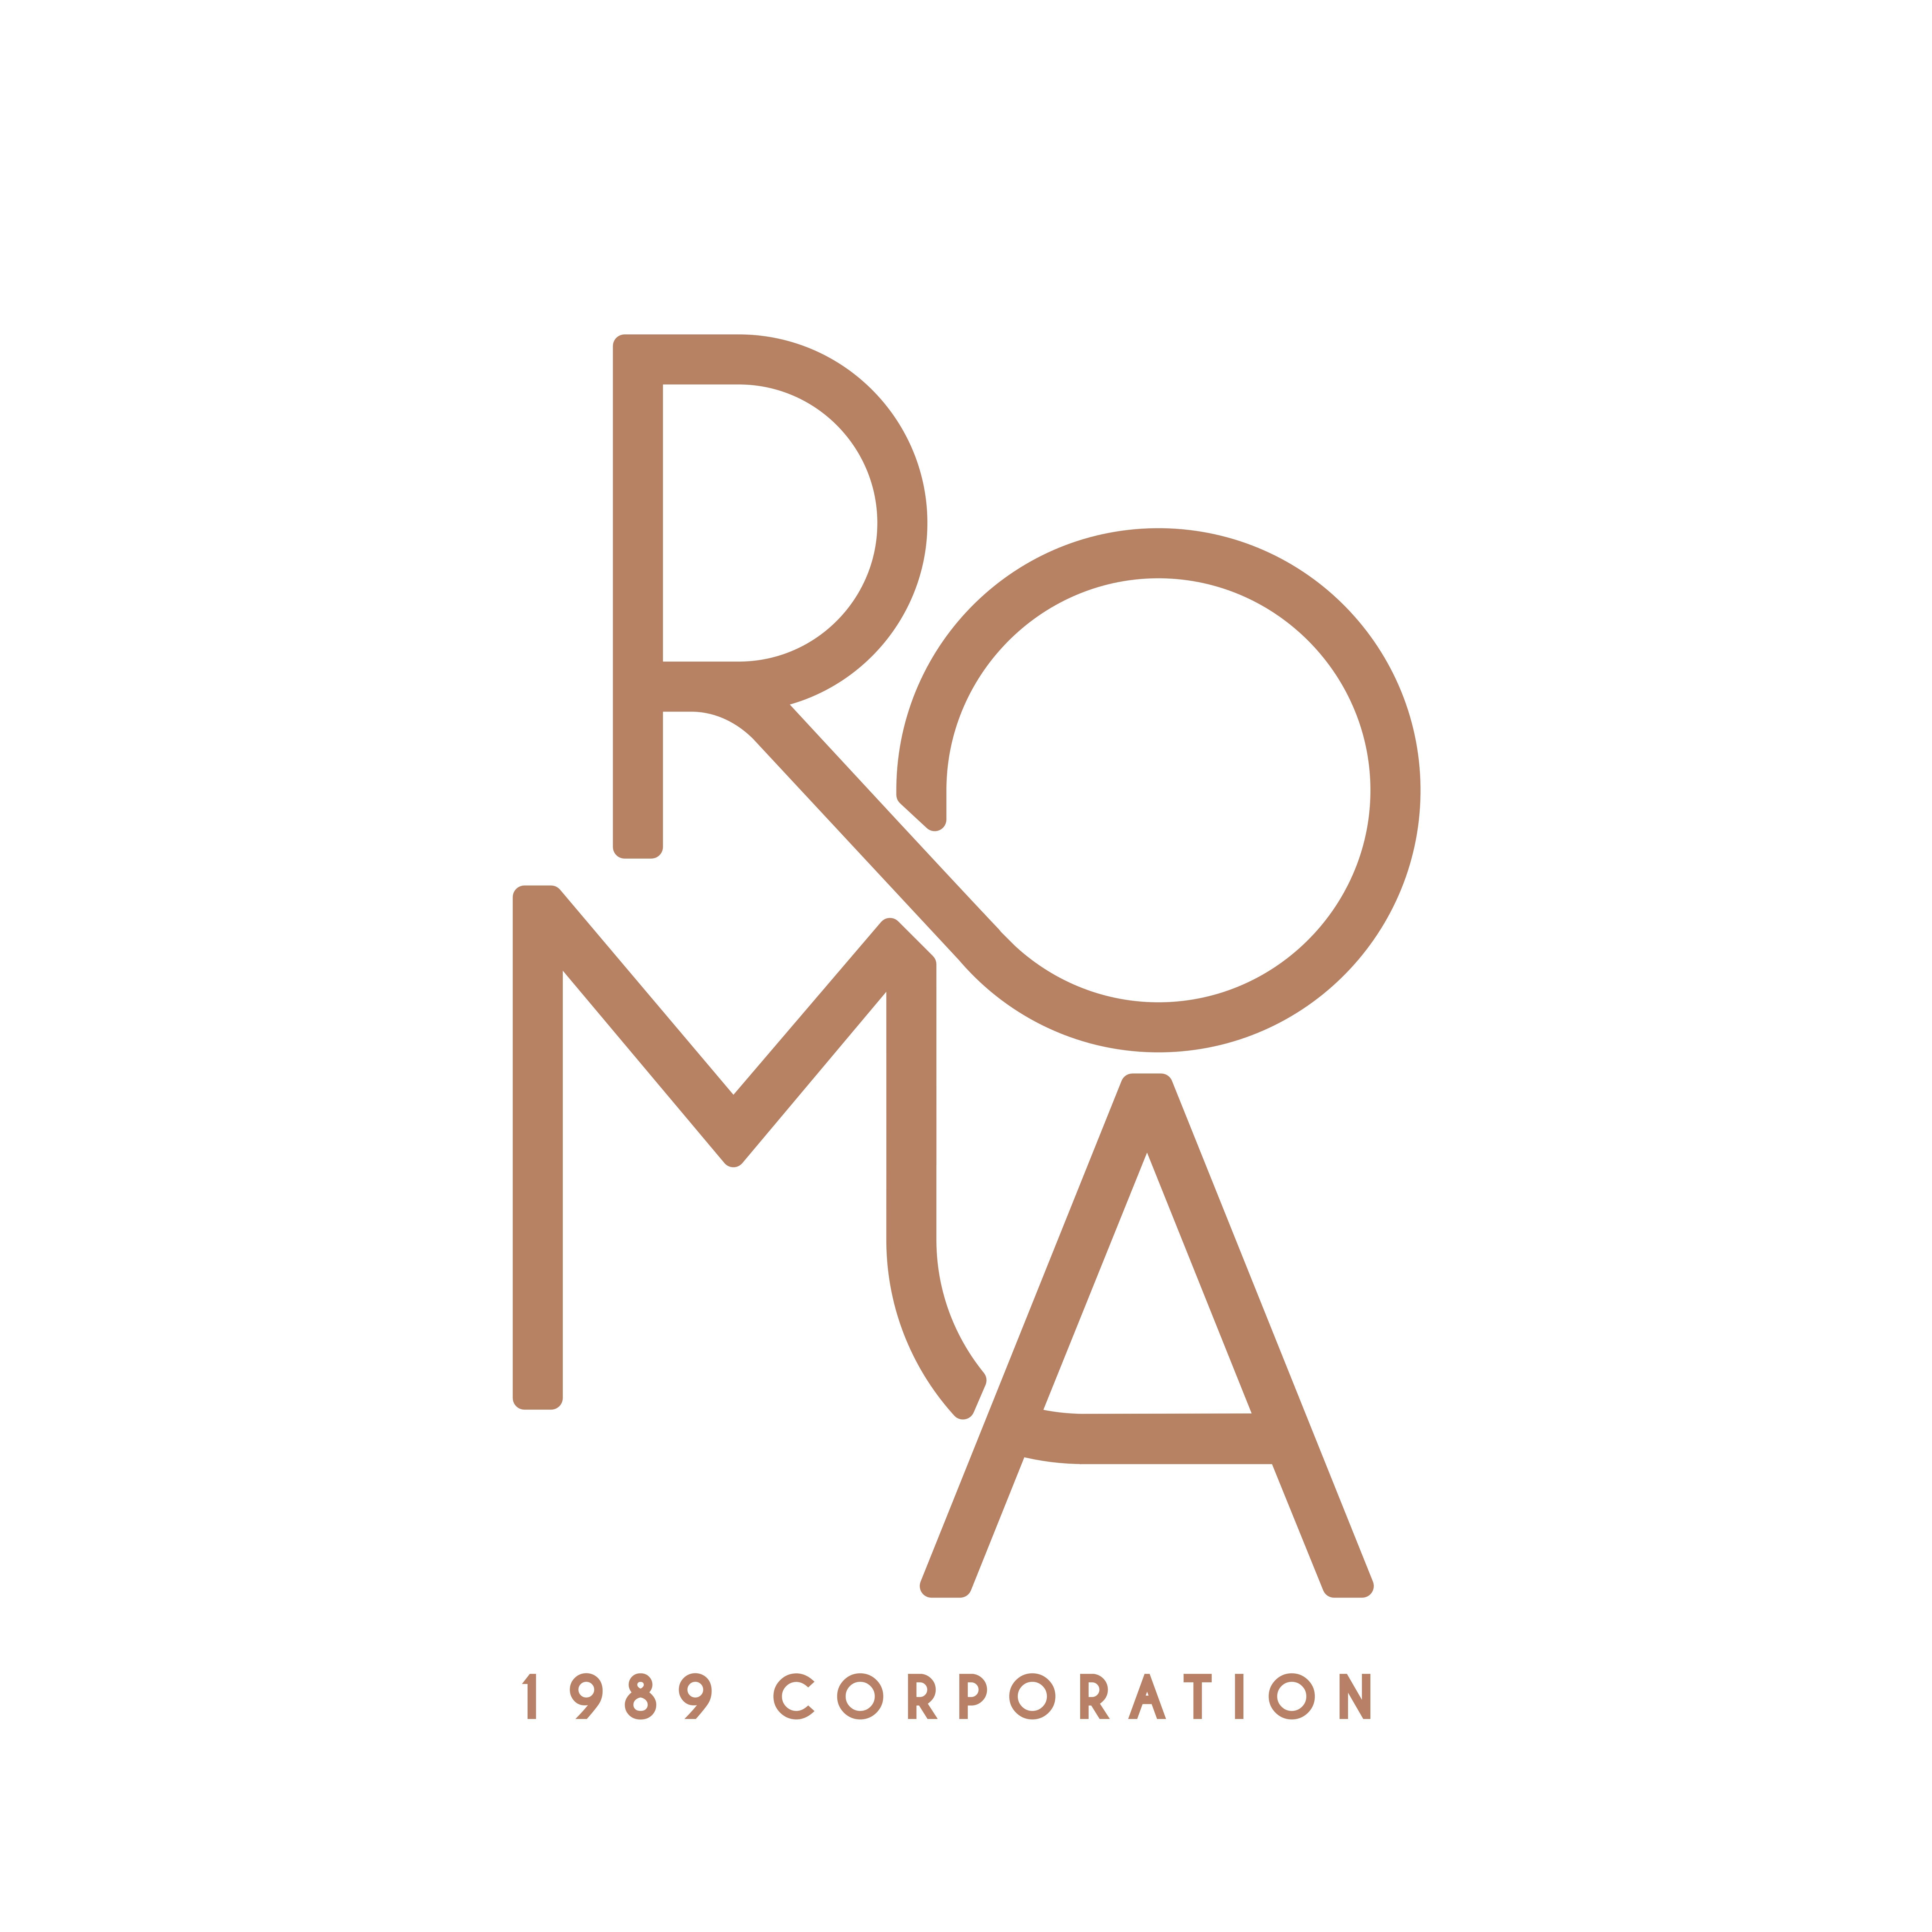 Roma 1989 Corporation